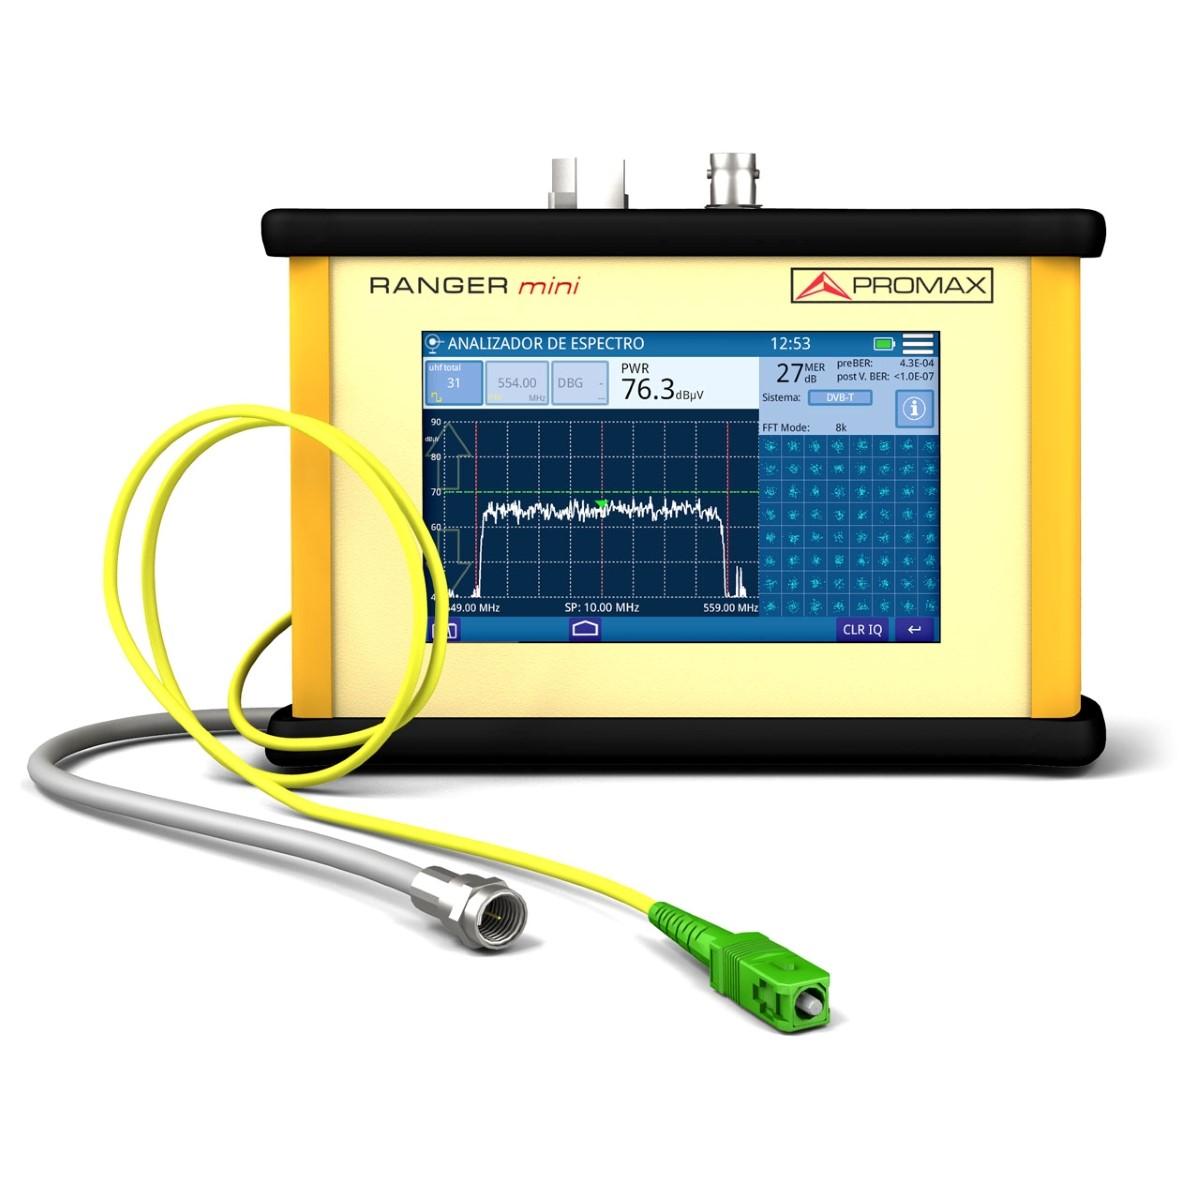 Medidor de campo para RF CATV DOCSIS y fibra óptica PROMAX RANGER mini 5 a 2700 MHz